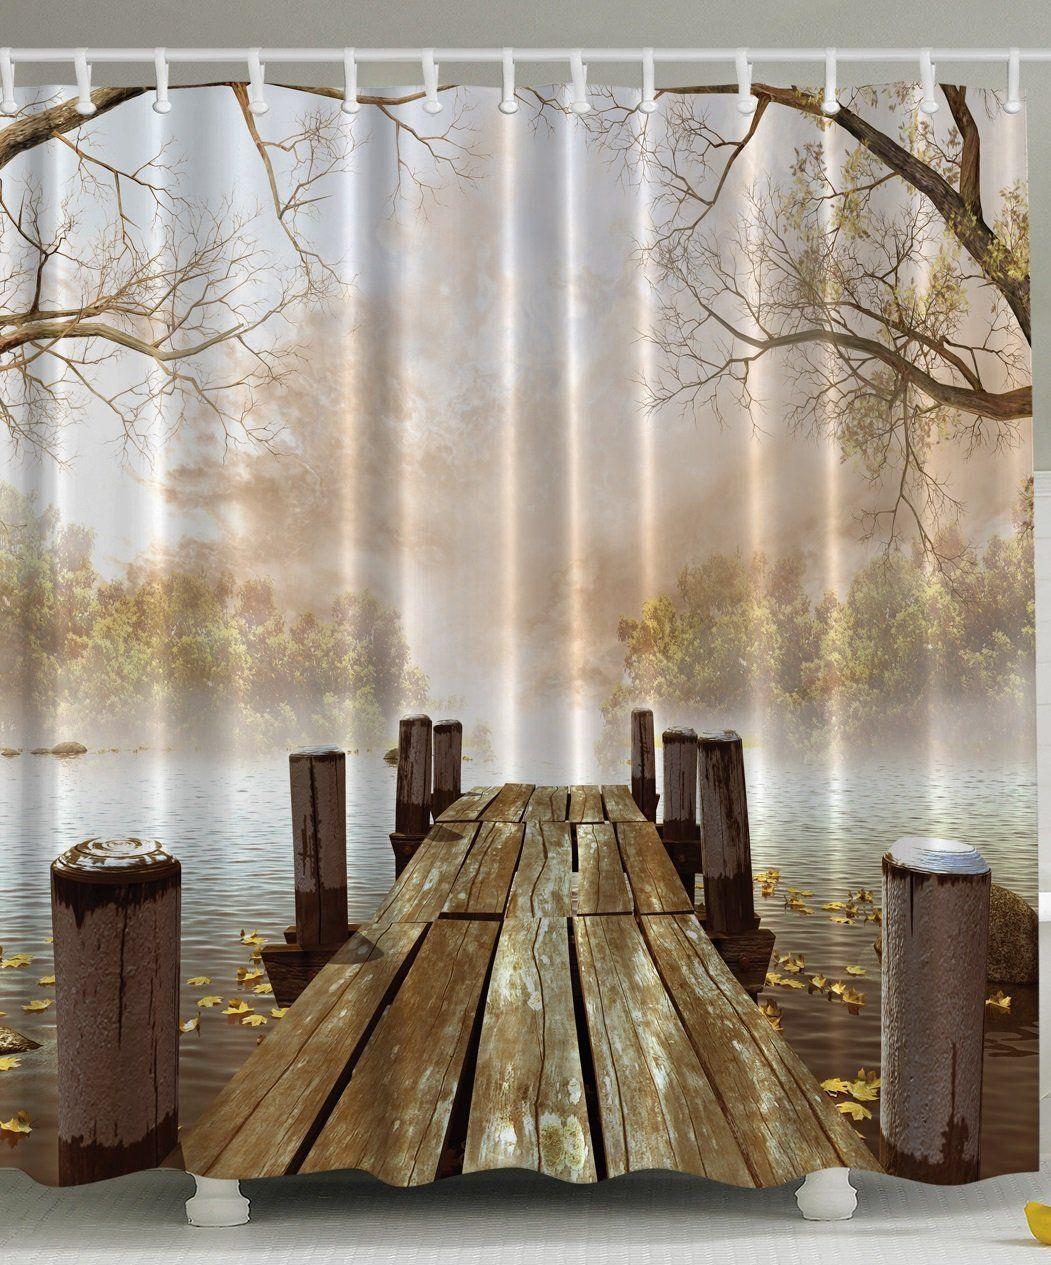 Amazon.com: Ocean Decor Fall Wooden Bridge Seasons Mother Day Gifts ...